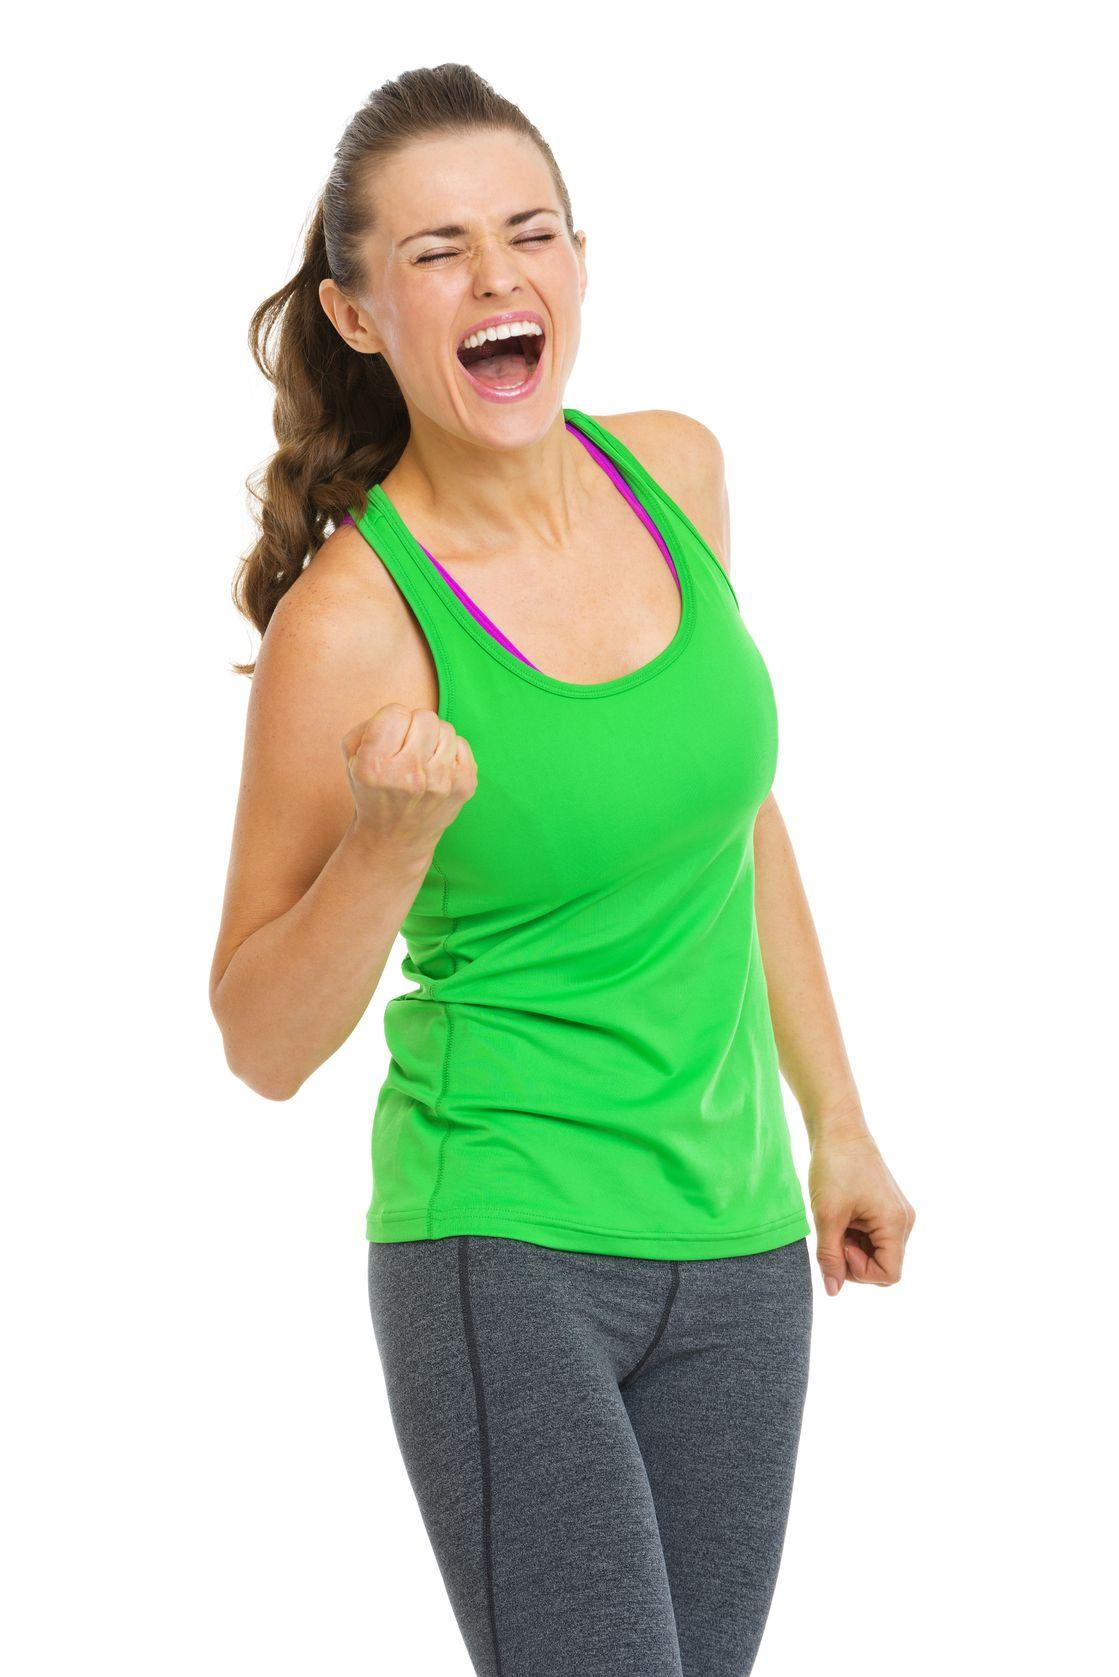 Switch Happy Fitness Woman.jpg